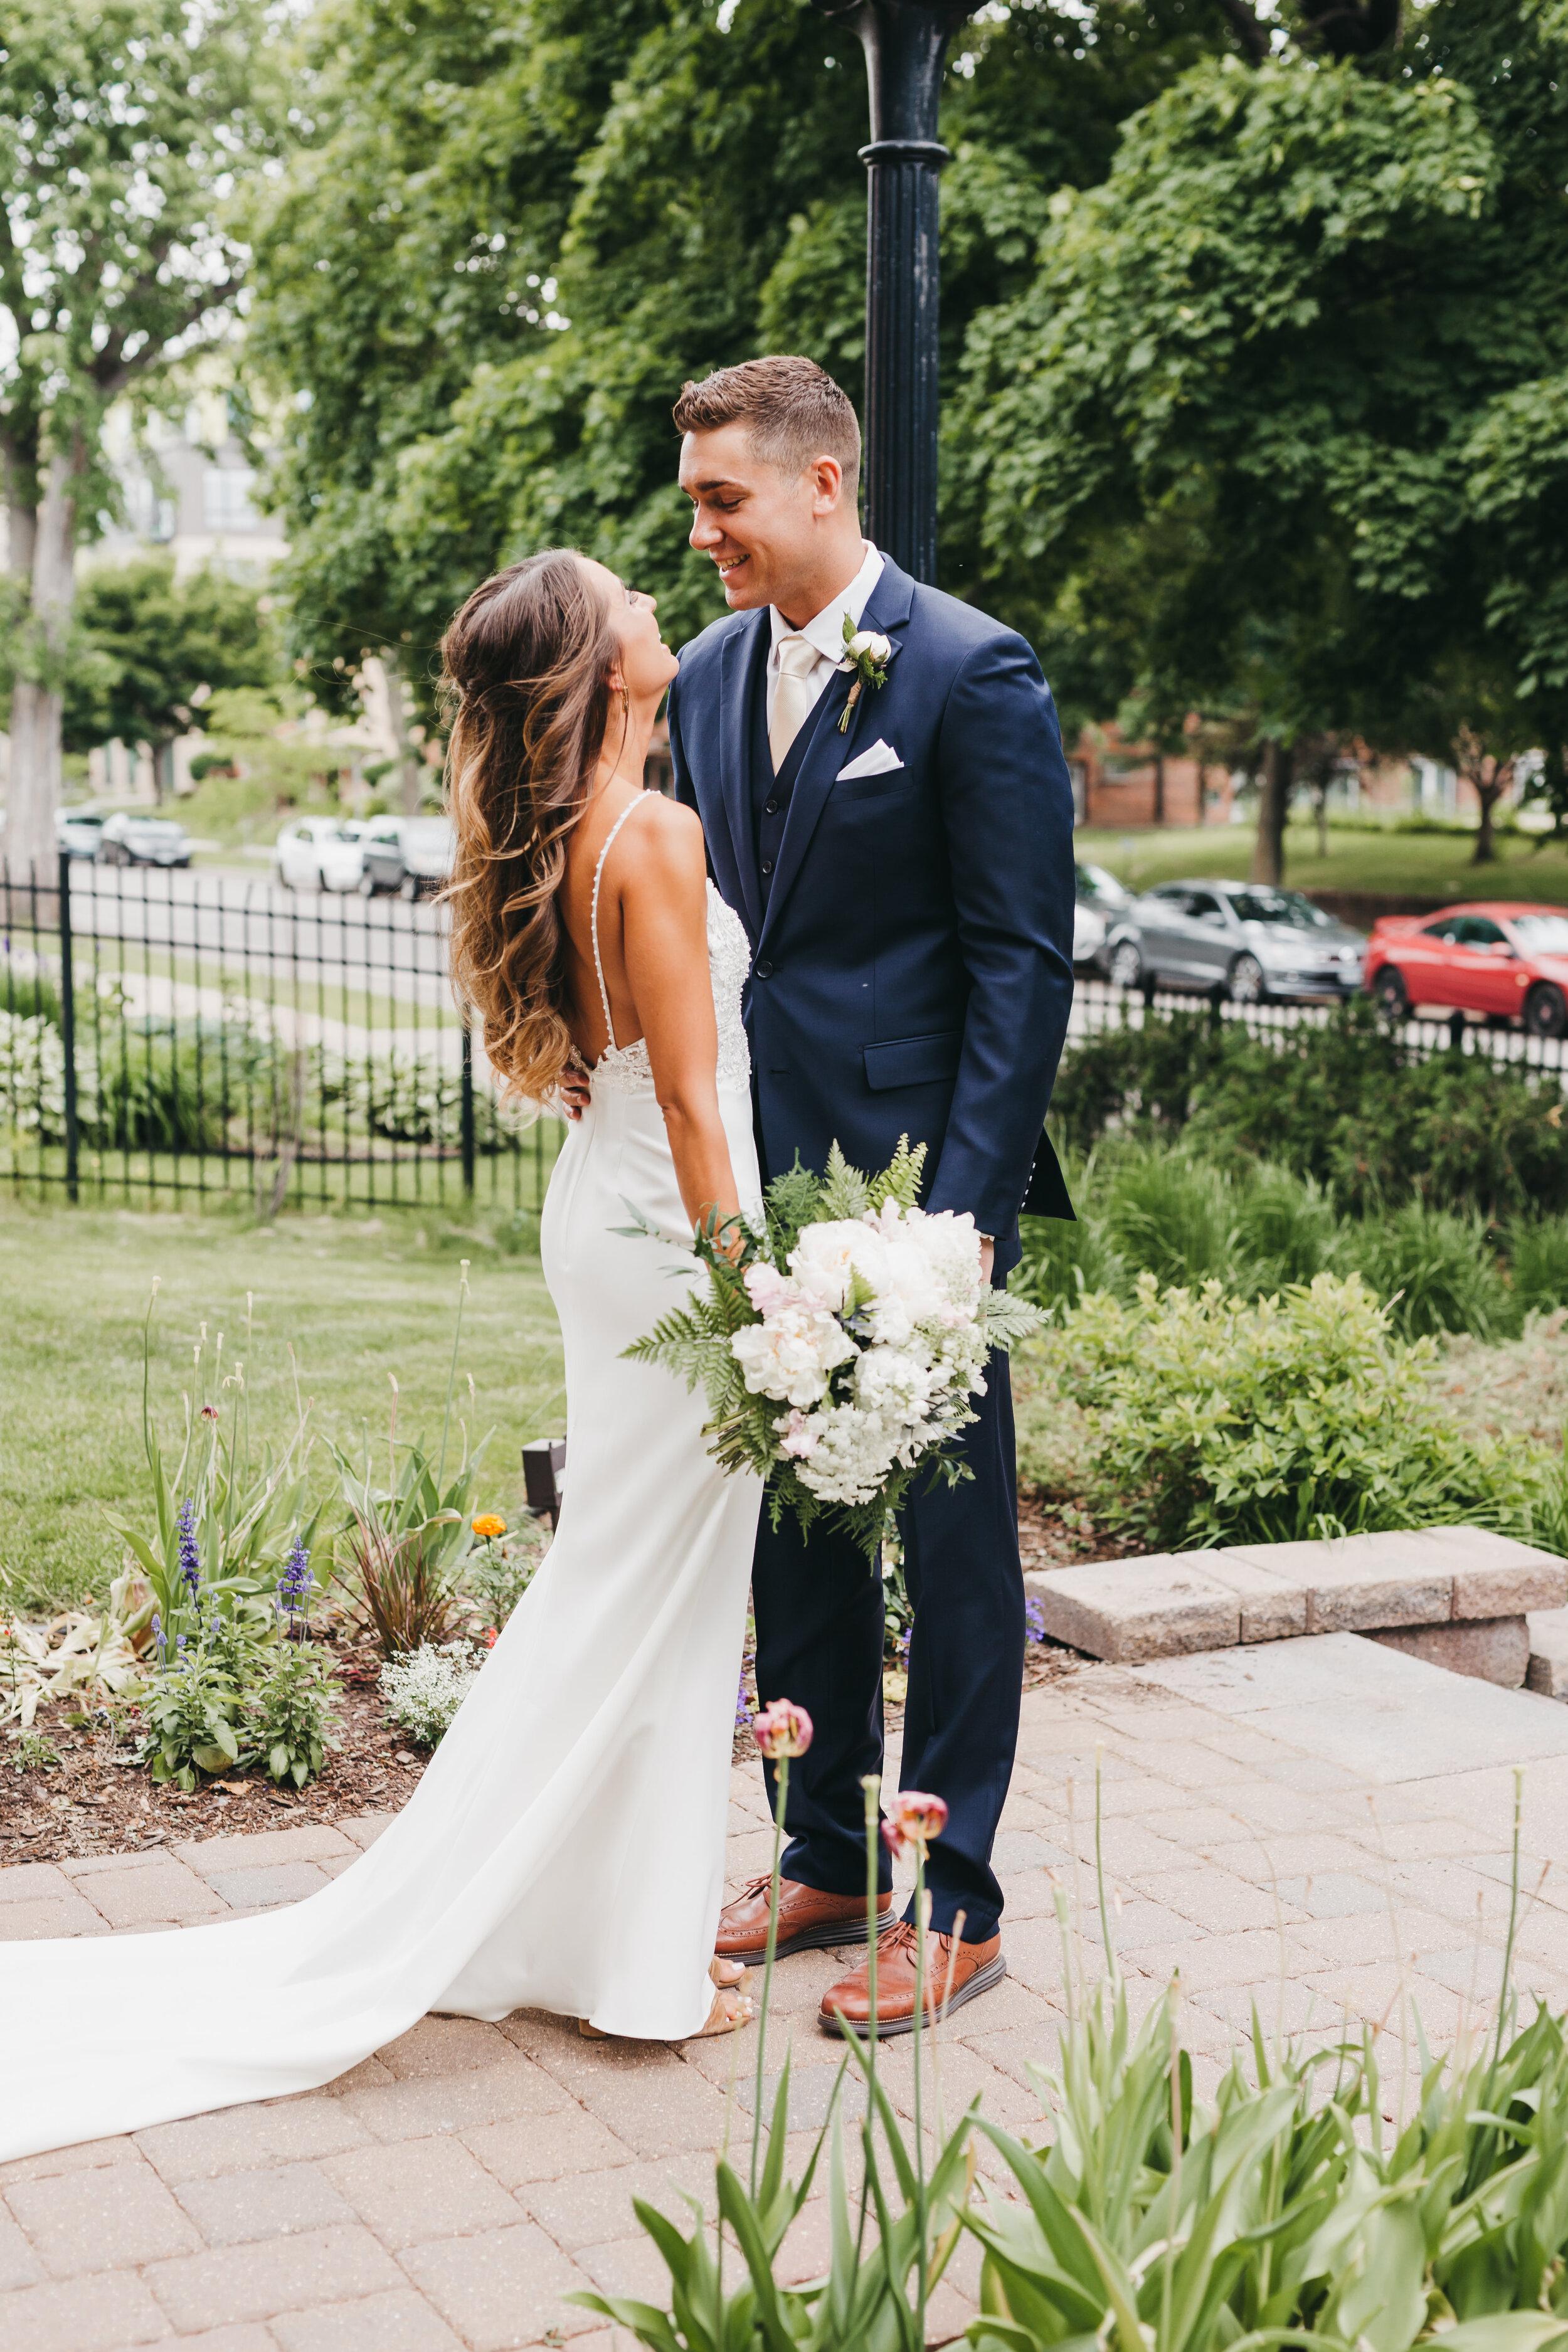 The Blaisdell Summer Wedding 2.jpg